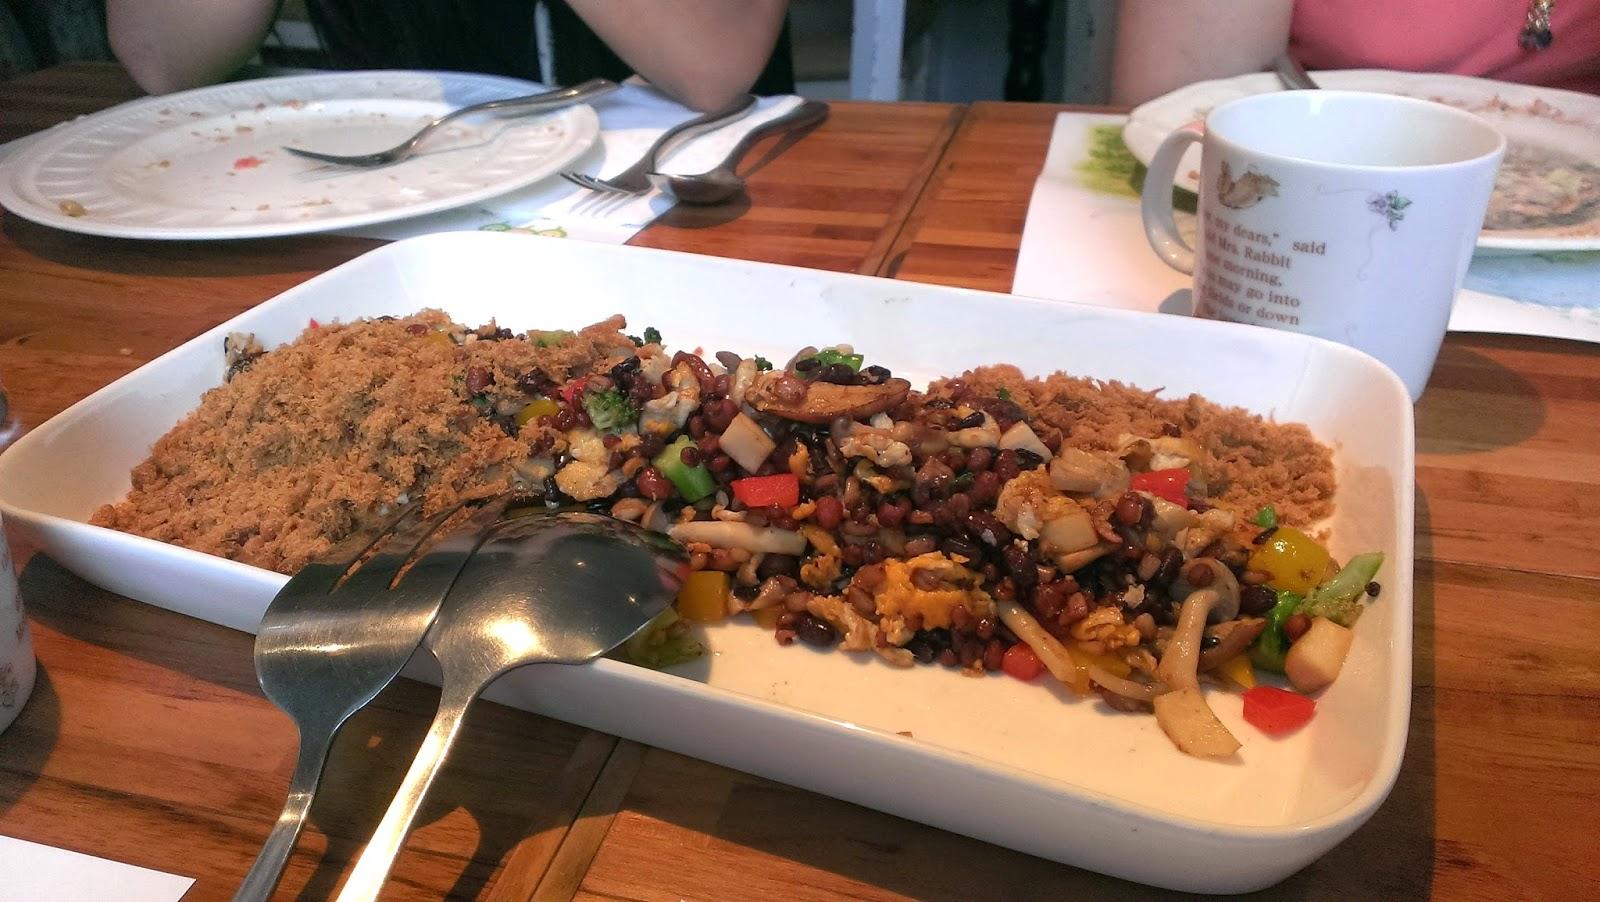 2014 09 08%2B12.55.52 - [食記] 芳庭彼得 - 義式創意無菜單料理,適合溫馨的小聚